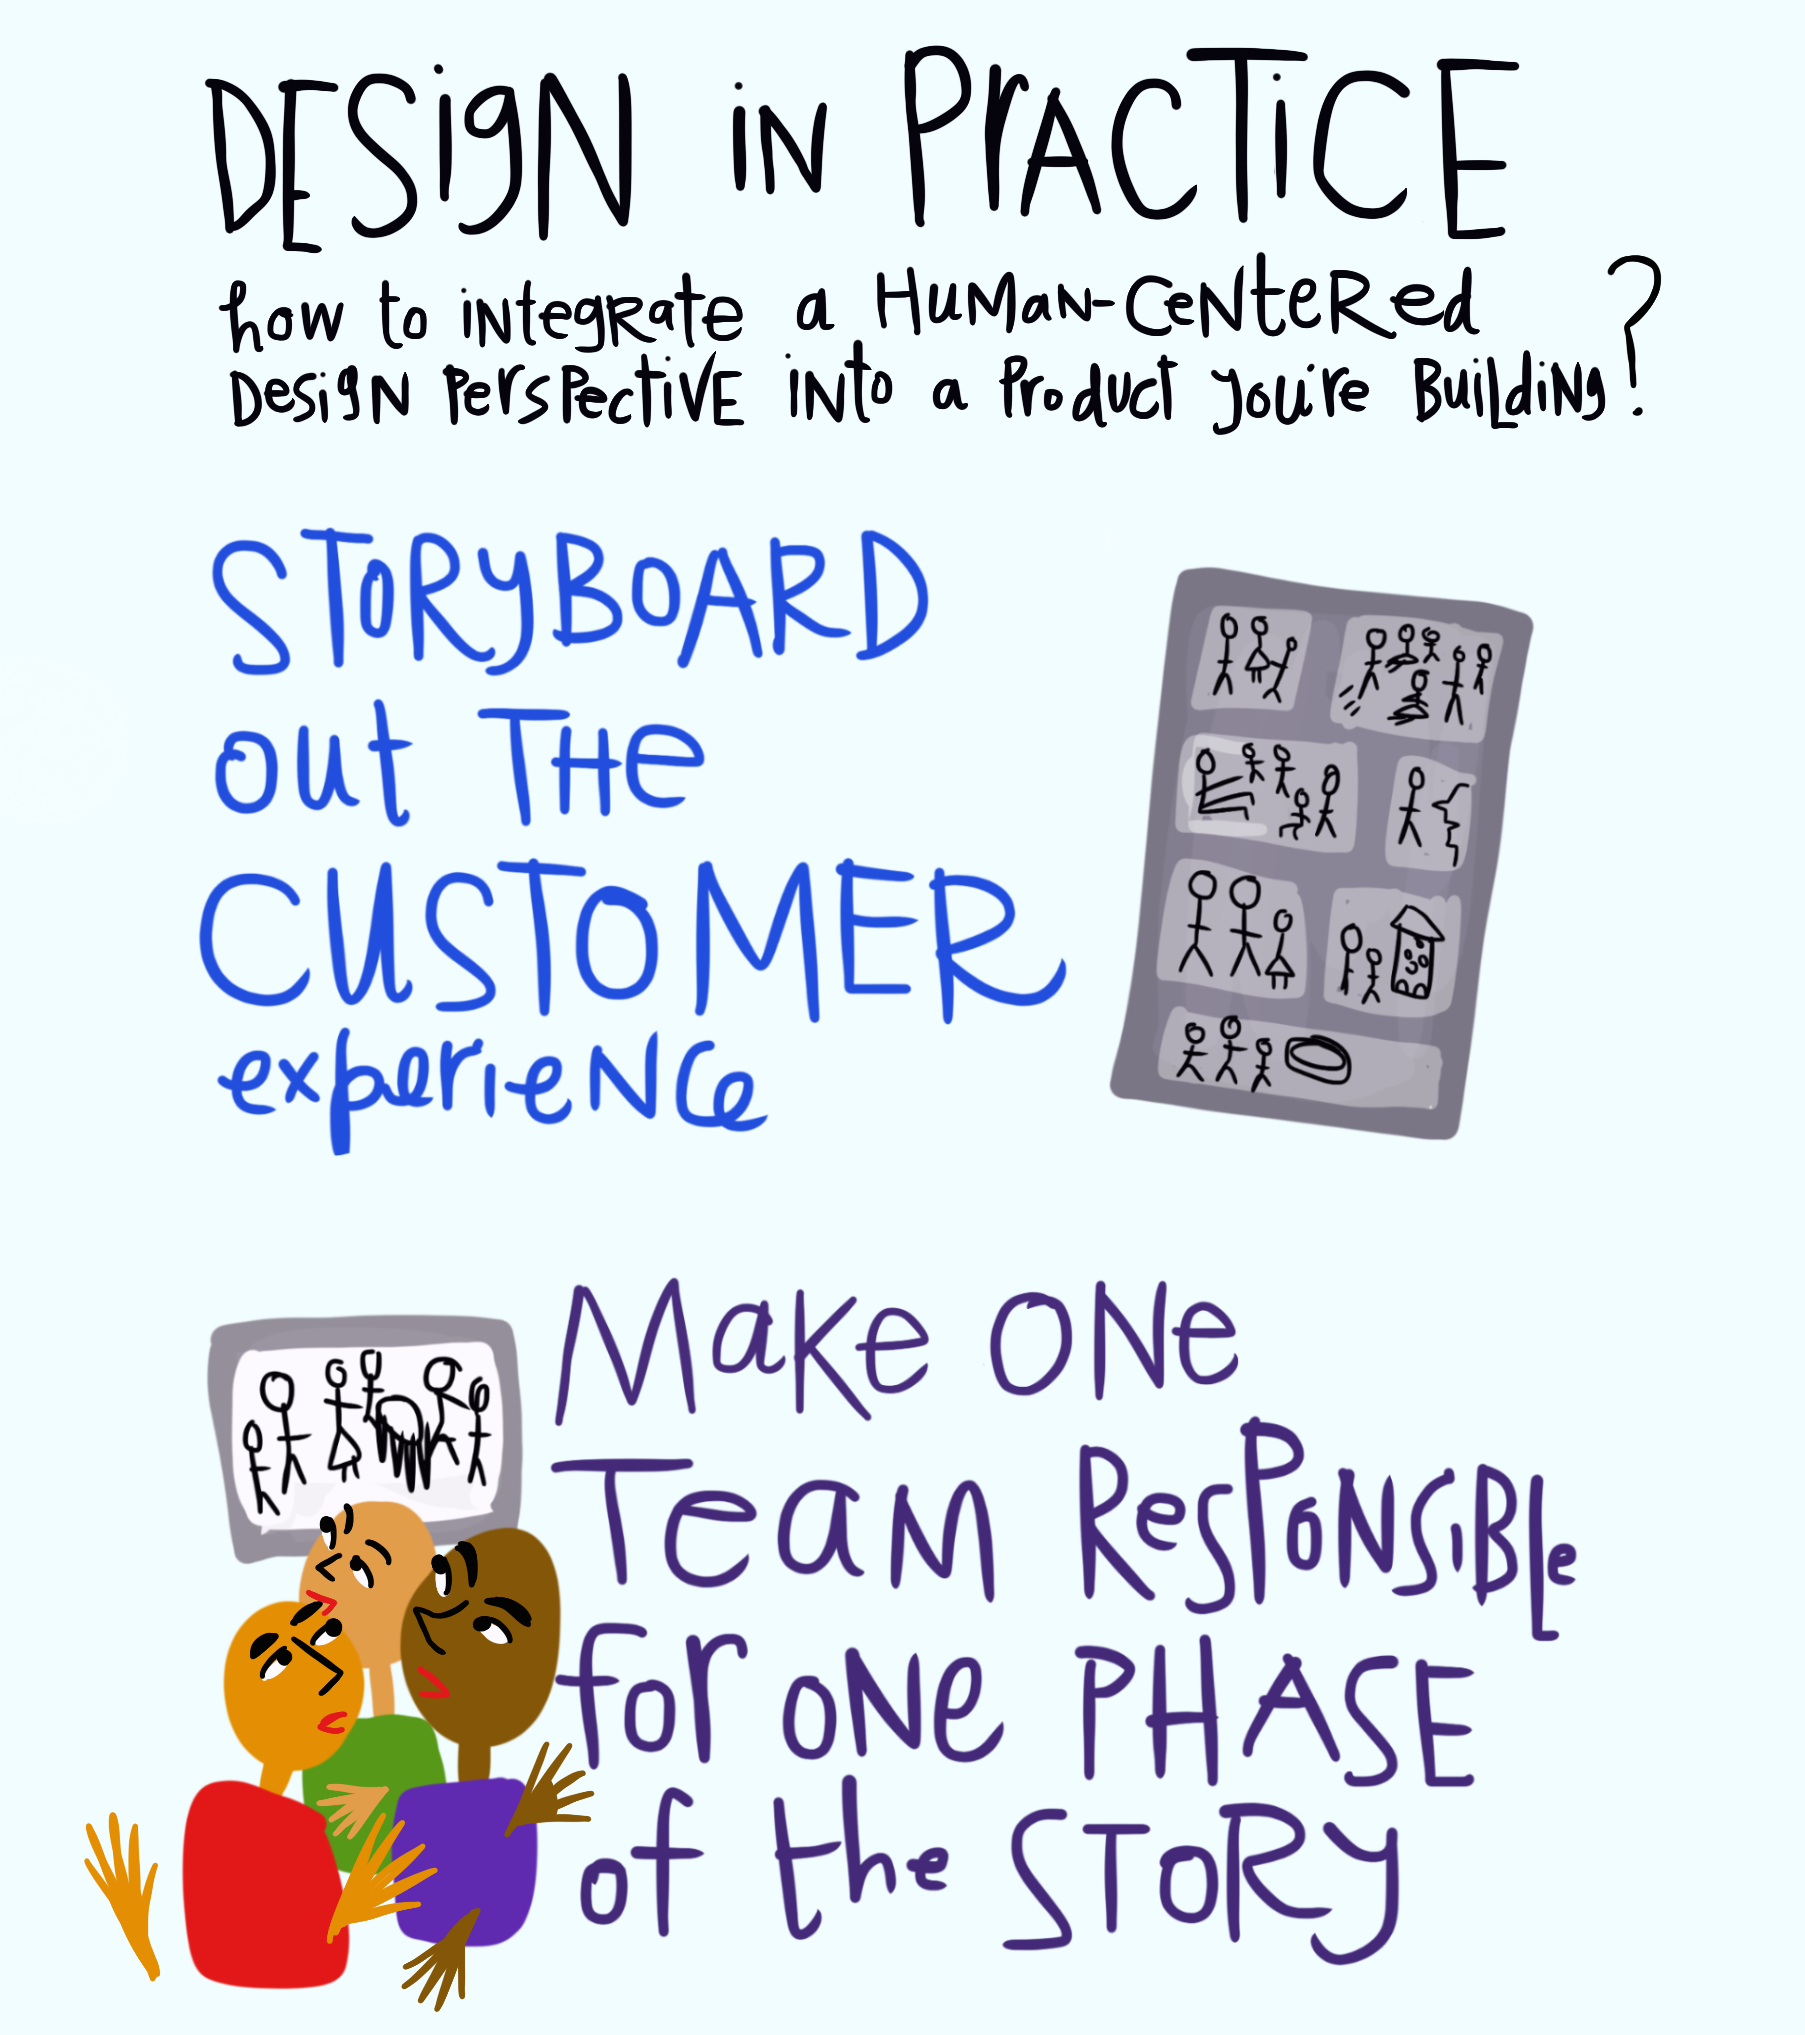 Notes on Design - Design in Practice